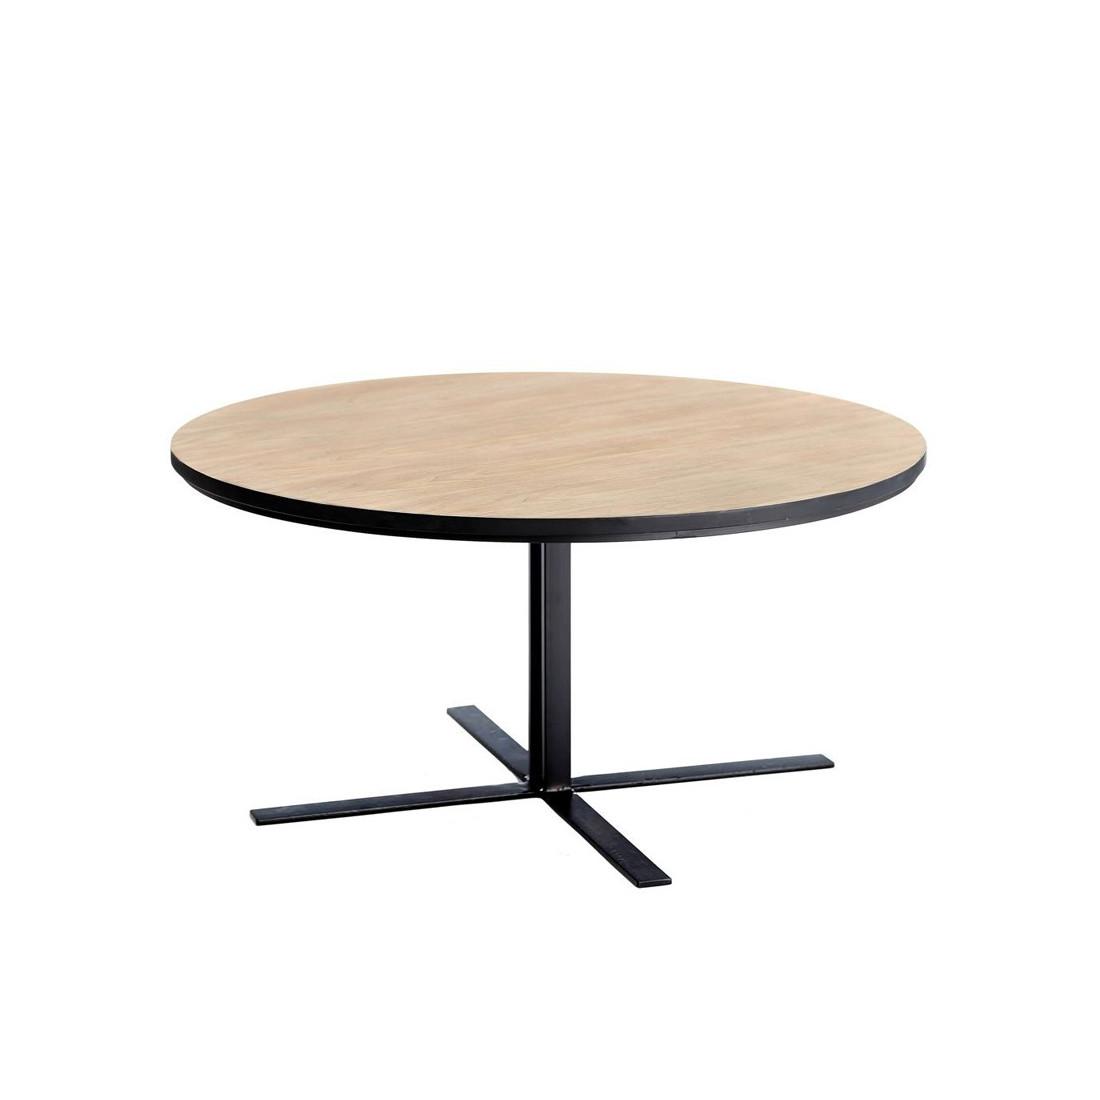 Table basse ronde brutus univers du salon tousmesmeubles - Table basse salon ronde ...